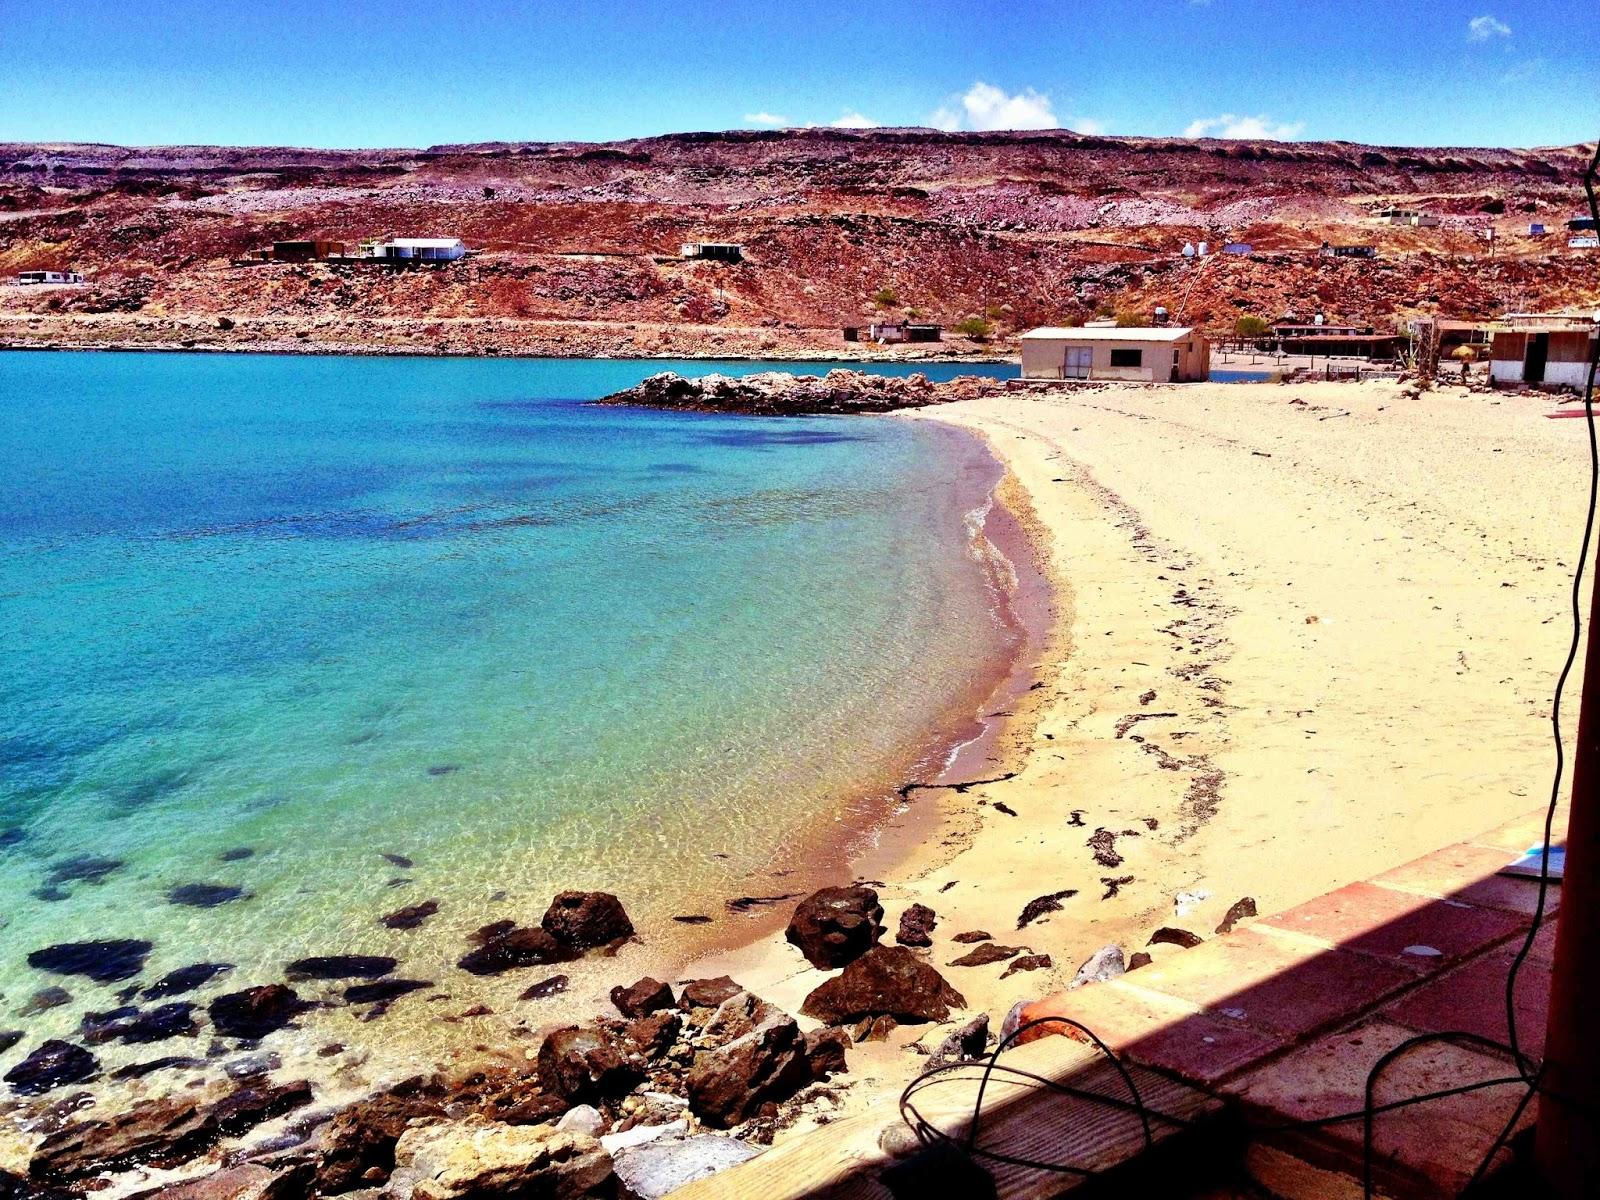 Alfred Snider Week 1 In Puertecitos Baja California 2013